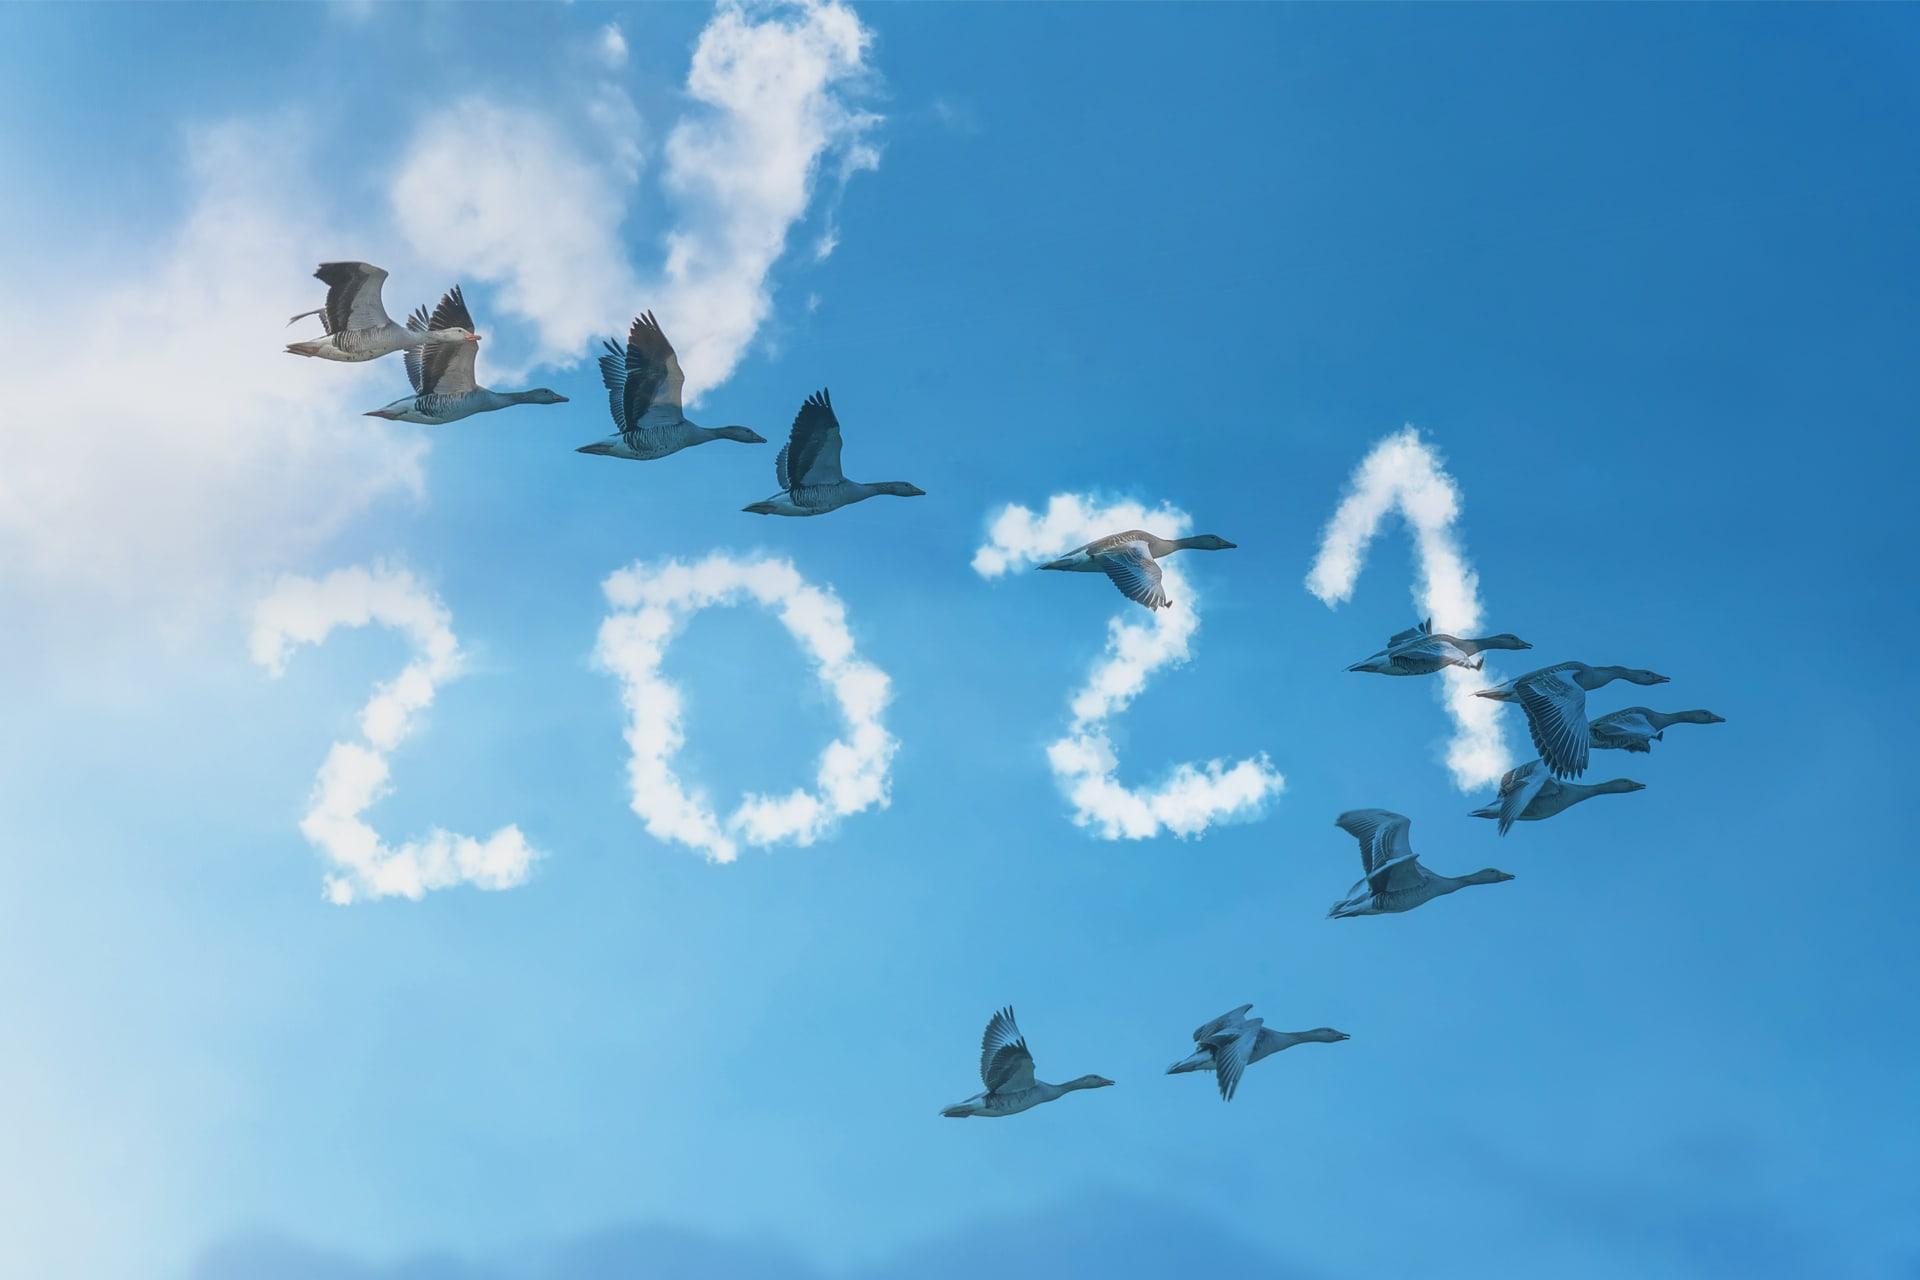 Flying Geese 2021